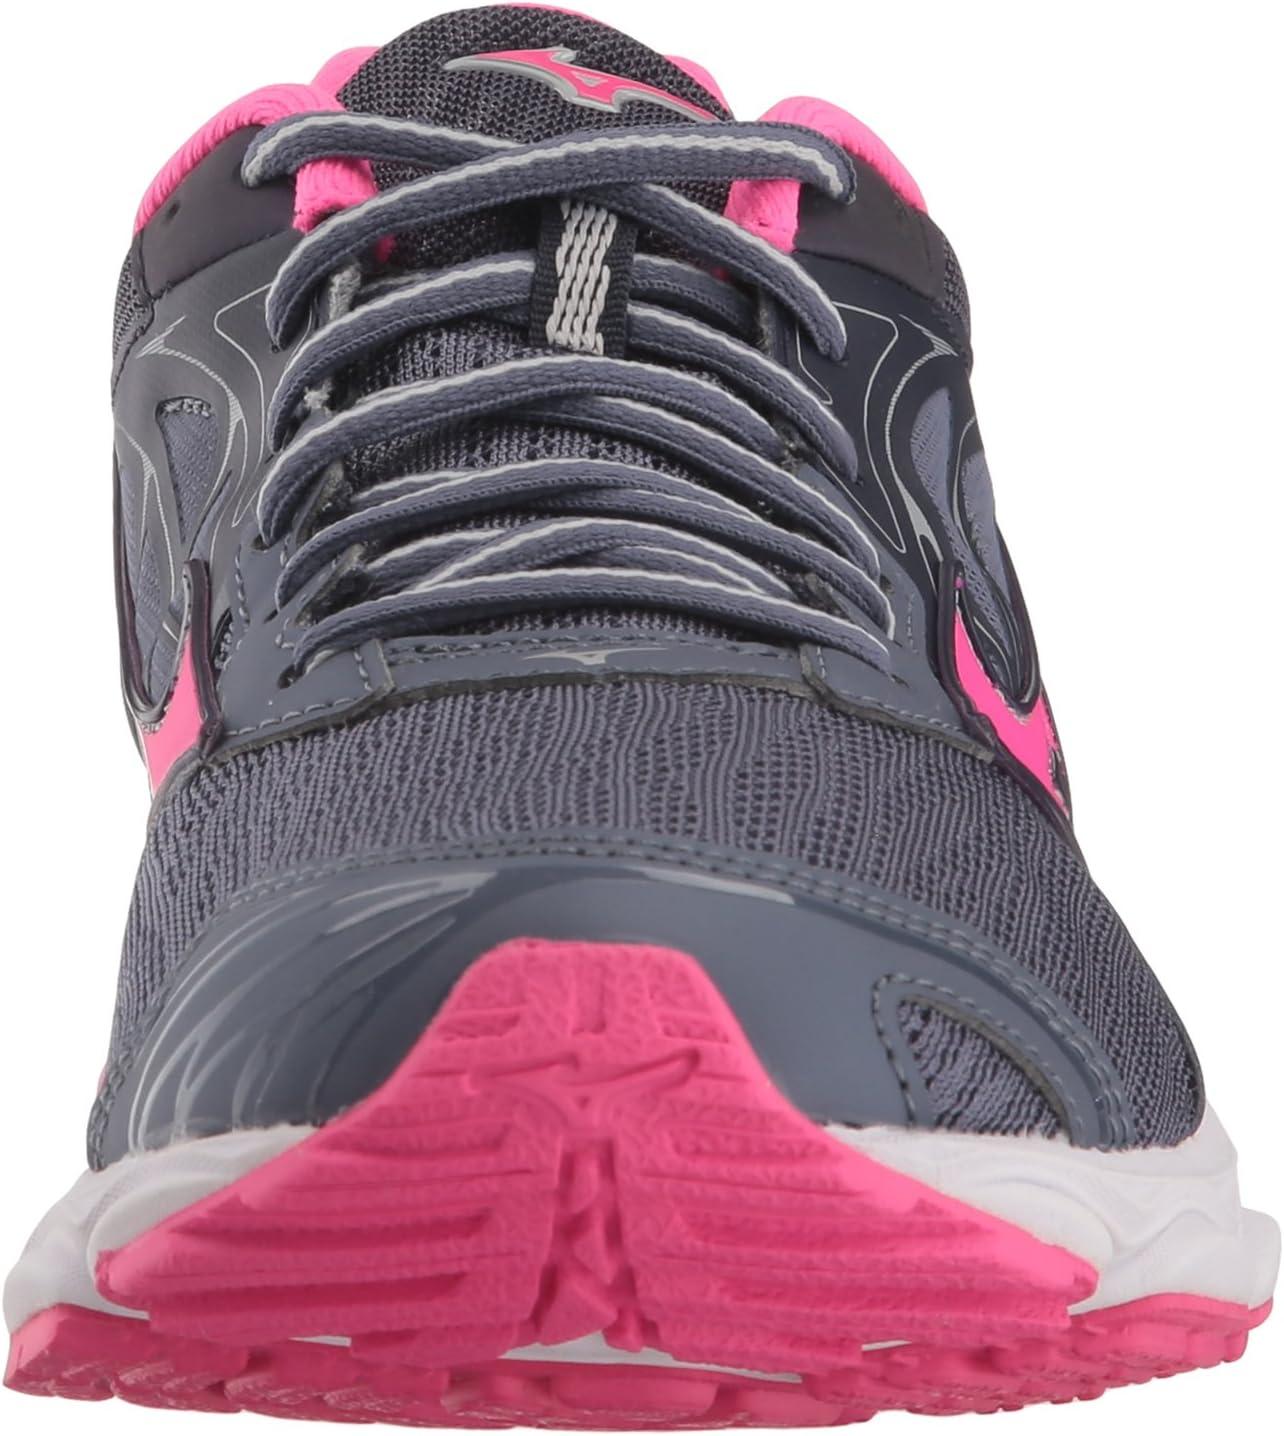 Mizuno Women's Wave Inspire 14 Running Folkstone Gray/Pink Glo